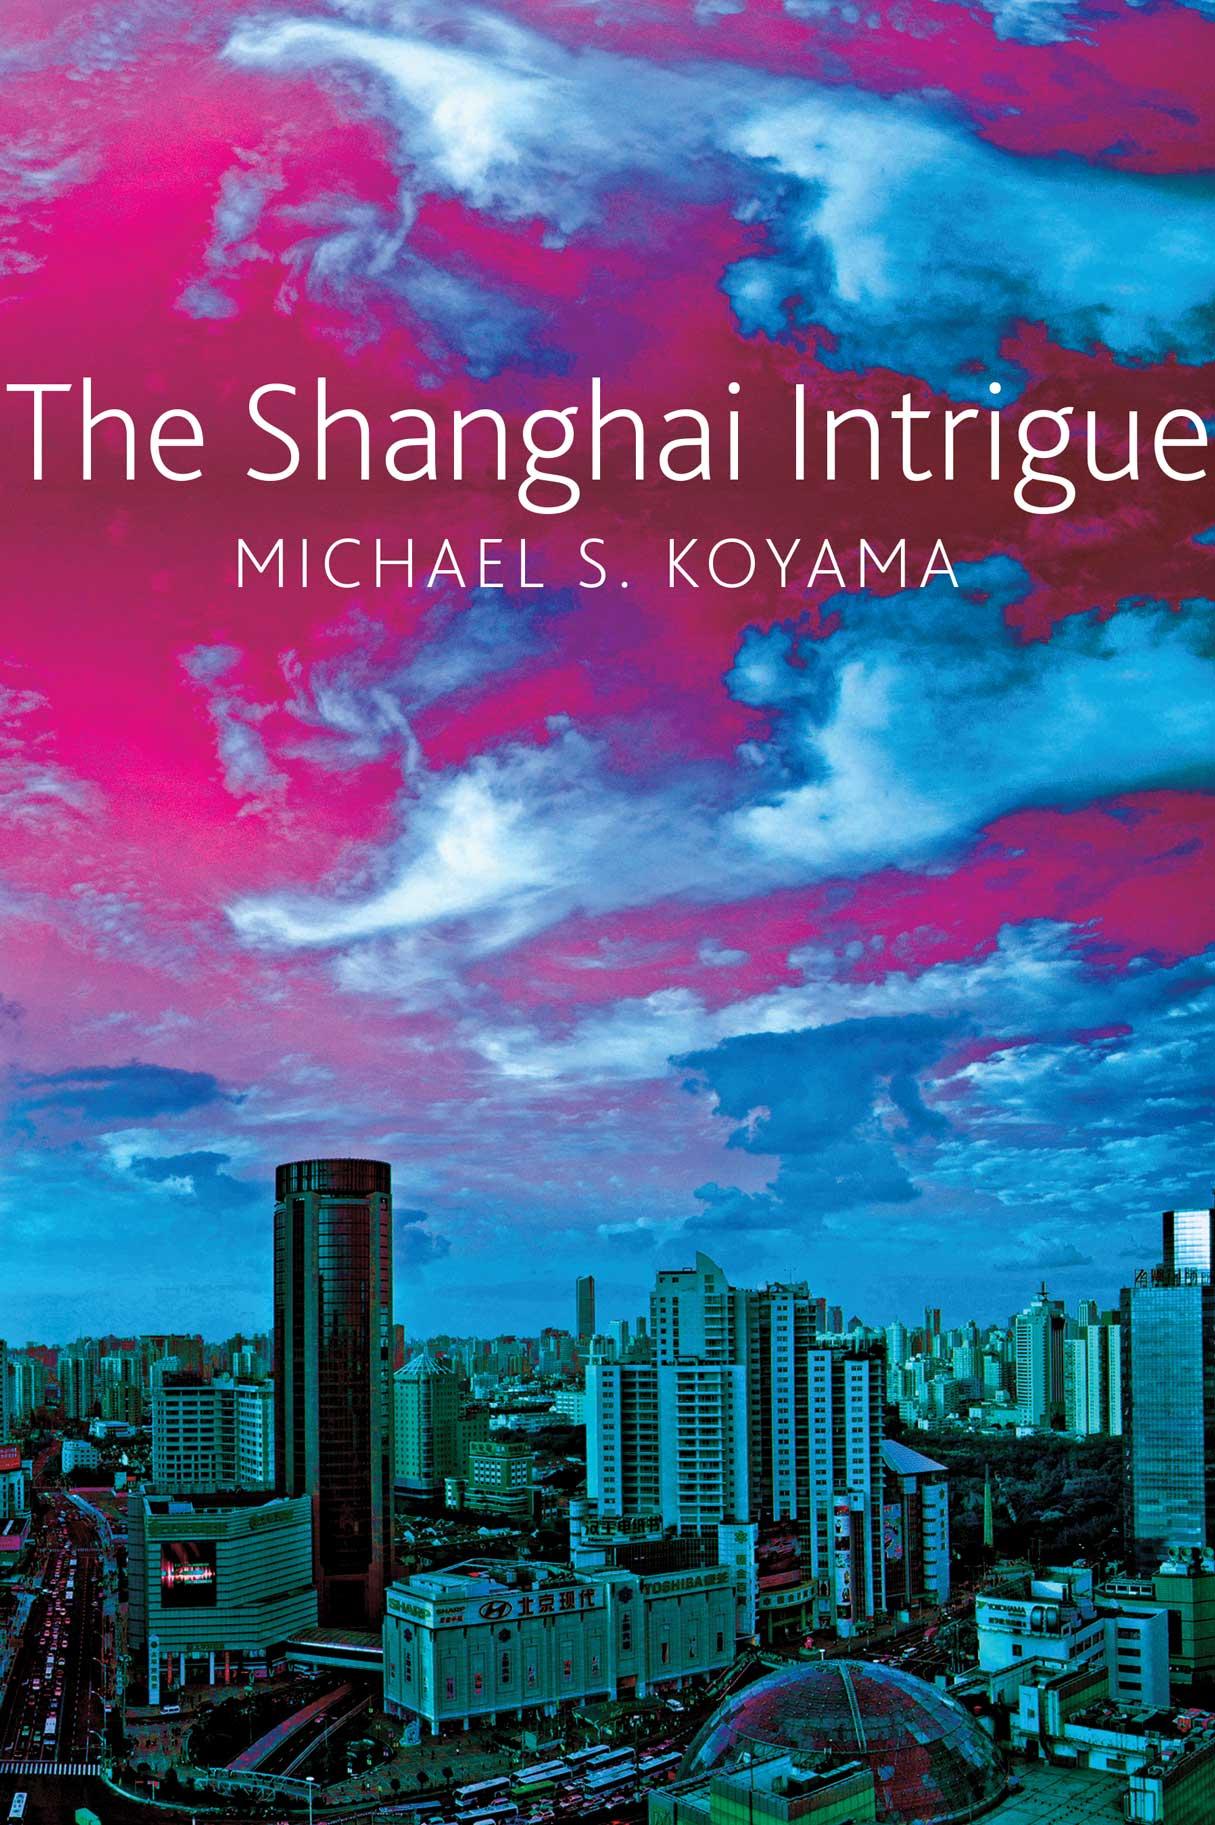 The Shanghai Intrigue by Michael S. Koyama |  Seagull Books